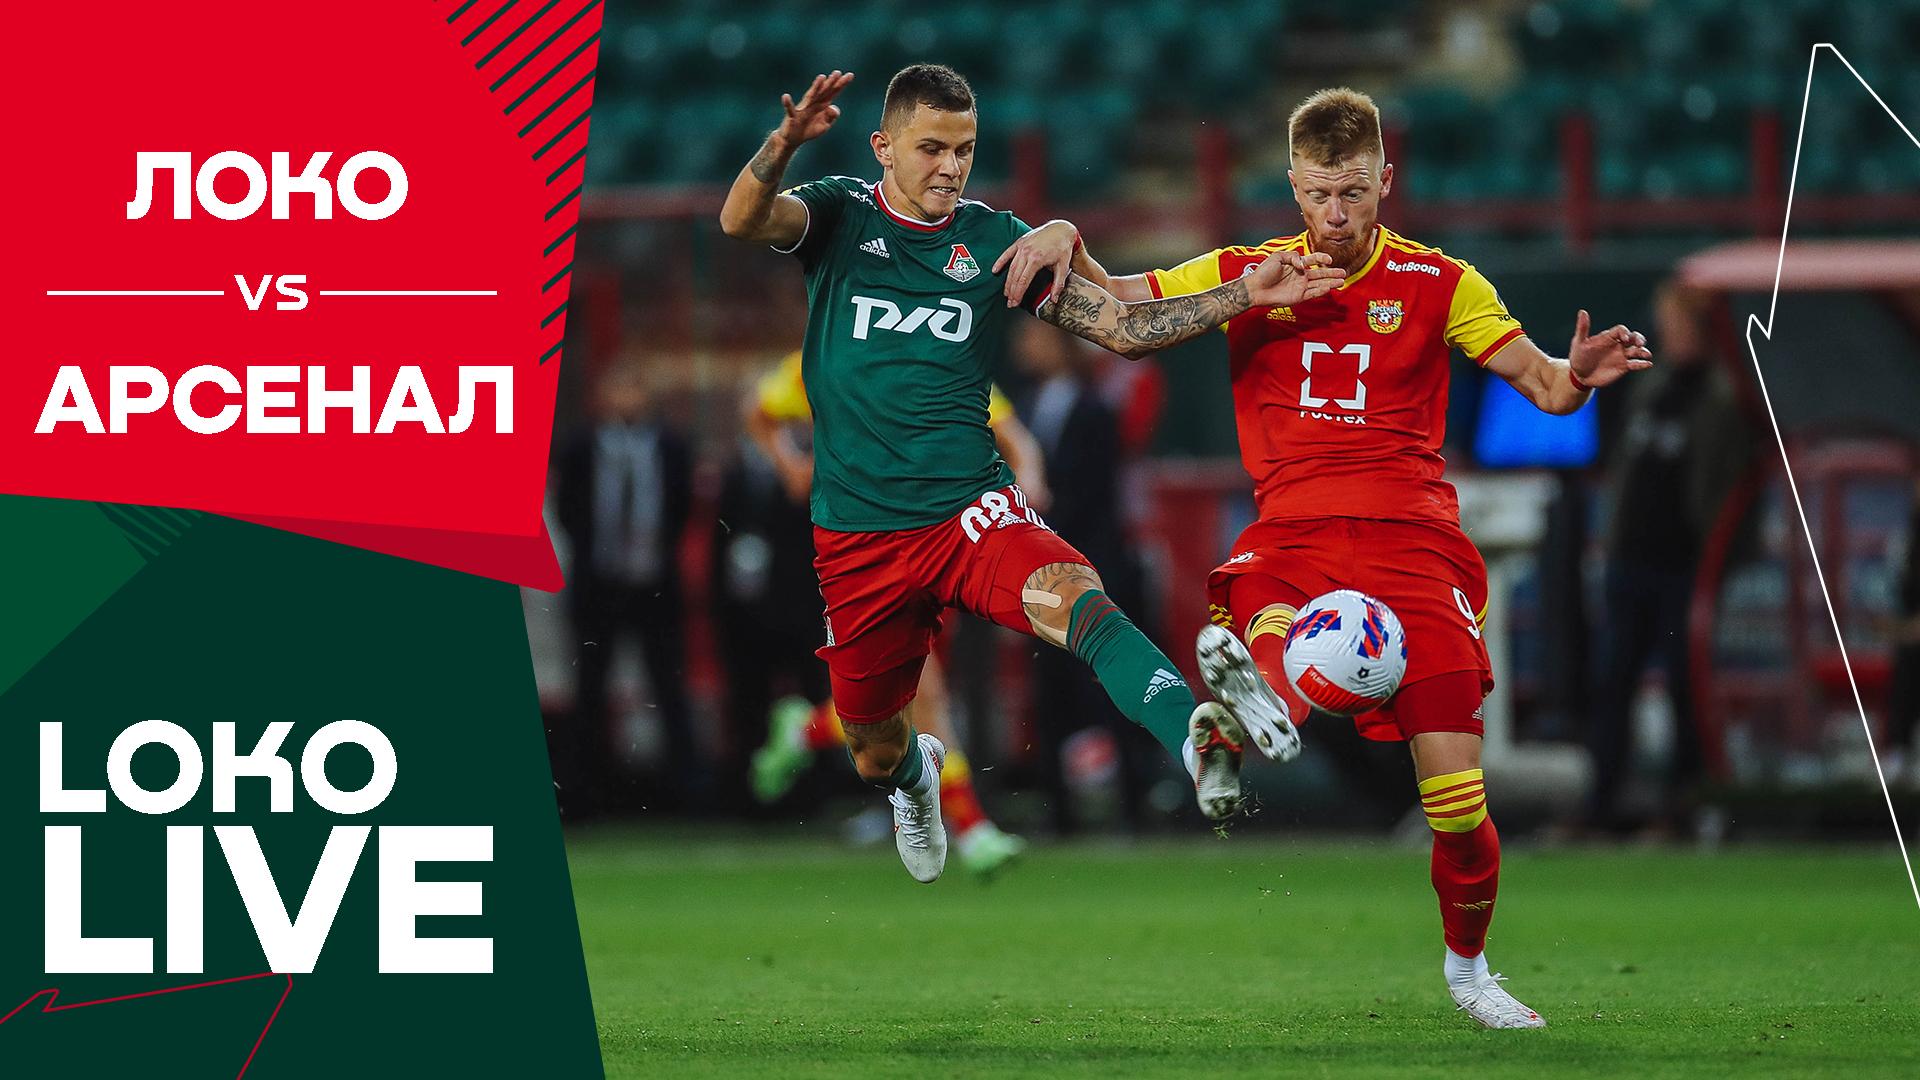 LOKO LIVE // Победа над «Арсеналом» // Акция в поддержку Лысова